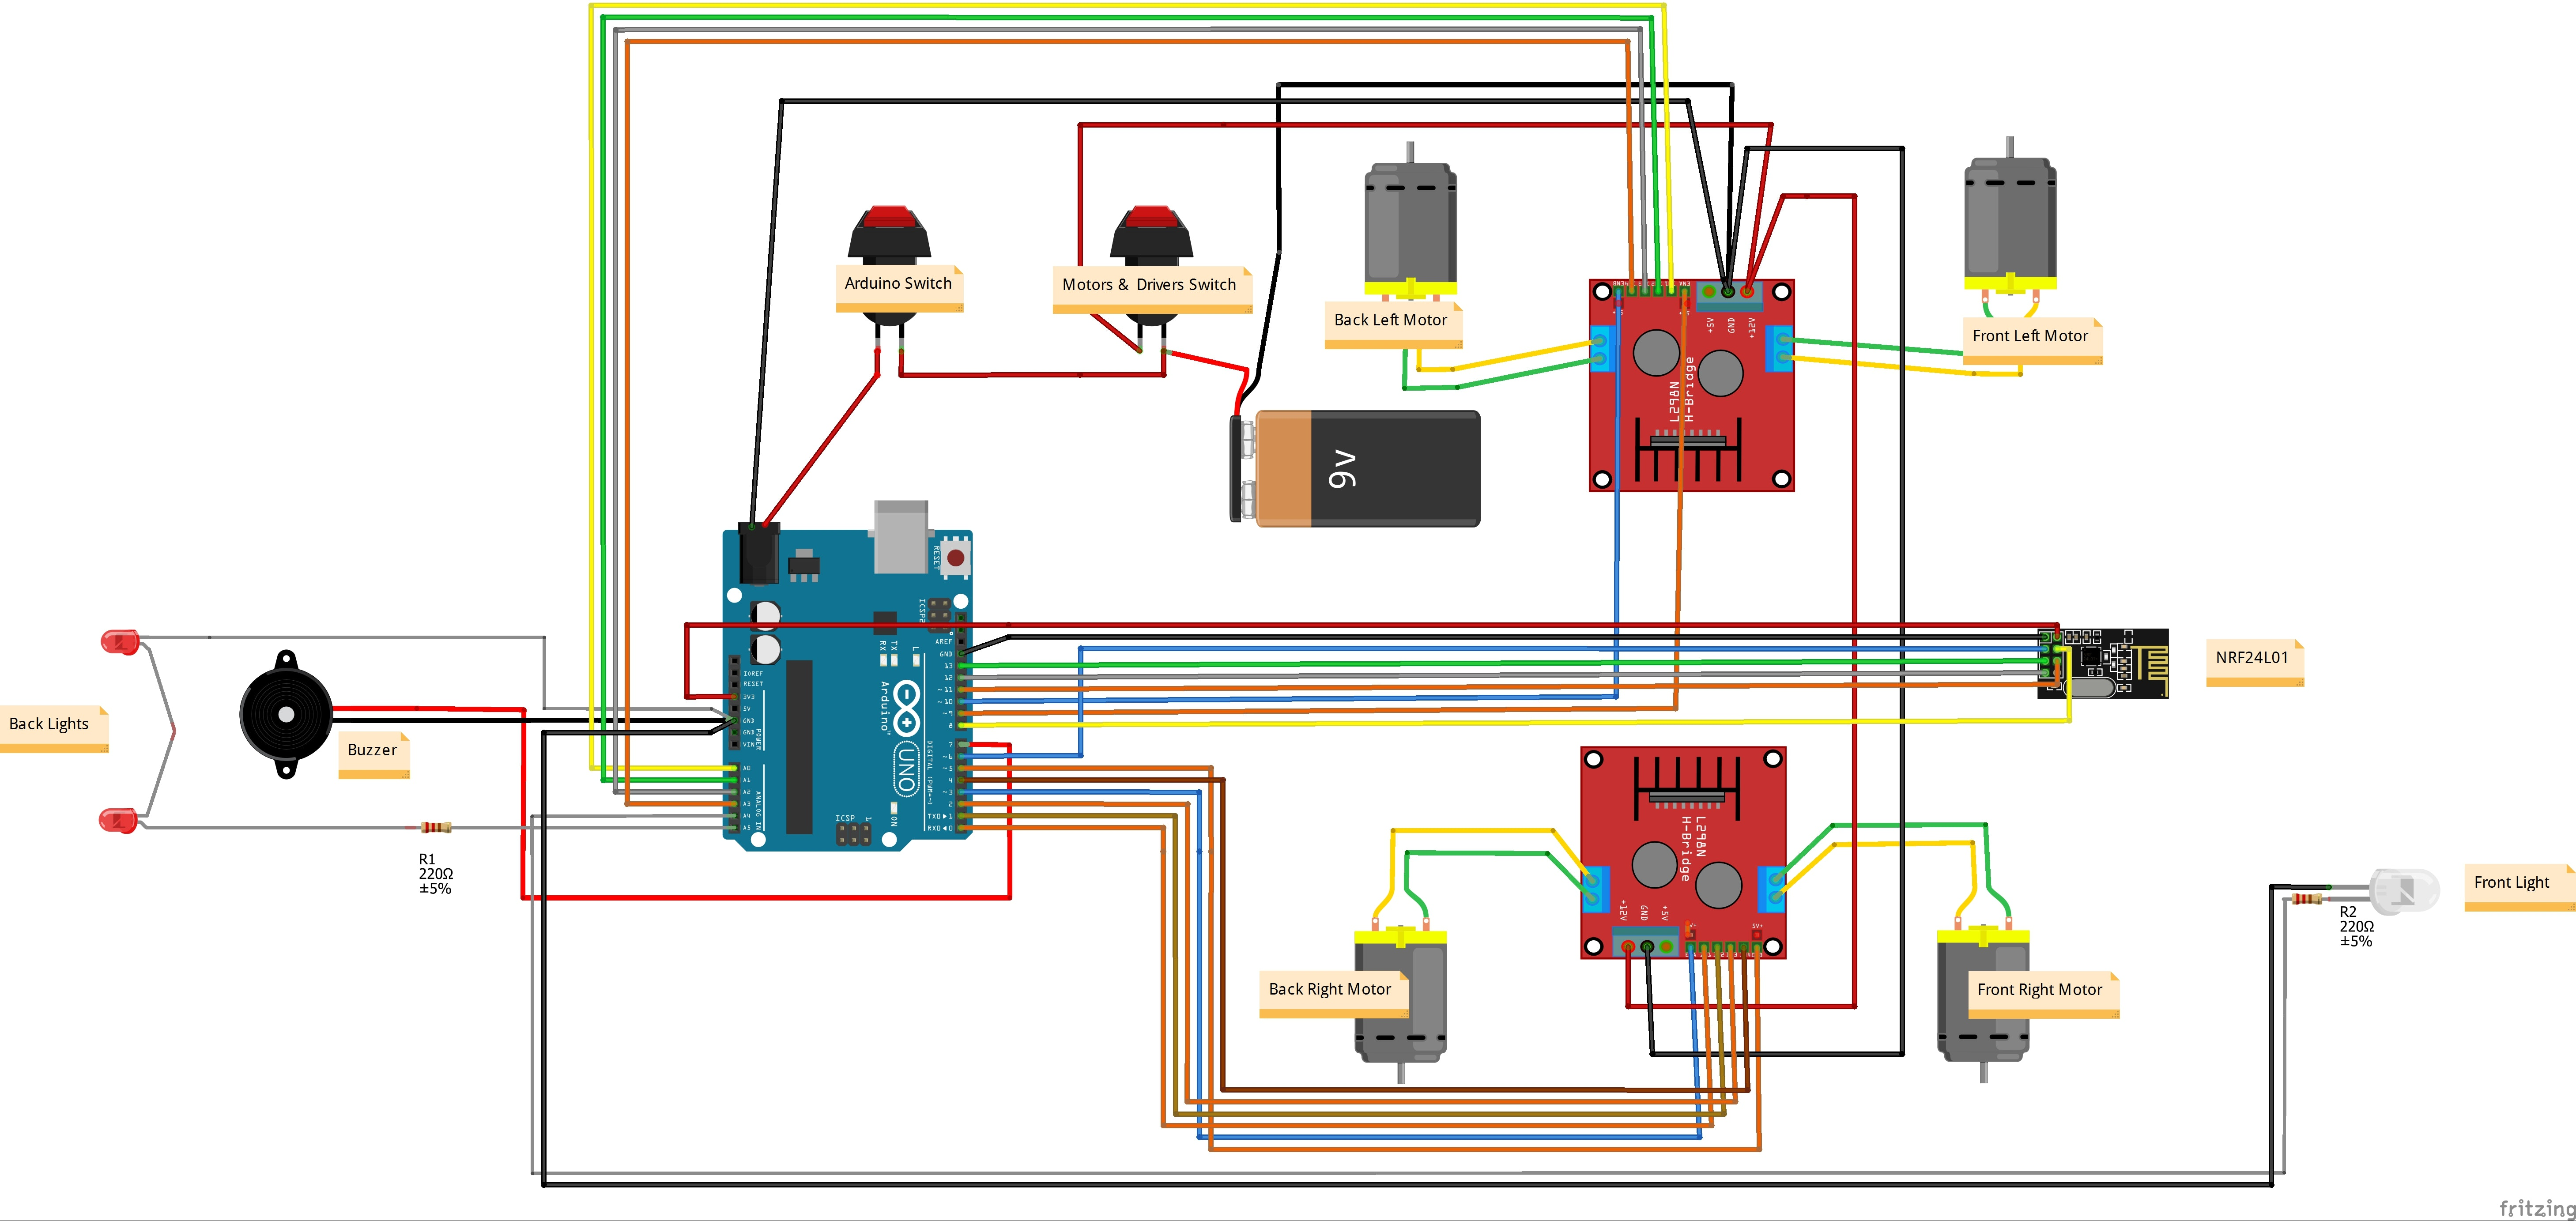 rc car wiring diagram schema wiring diagram online rh 6 9 10 travelmate nz de Small RC Car Schematic RC Car Mechanical Drawing